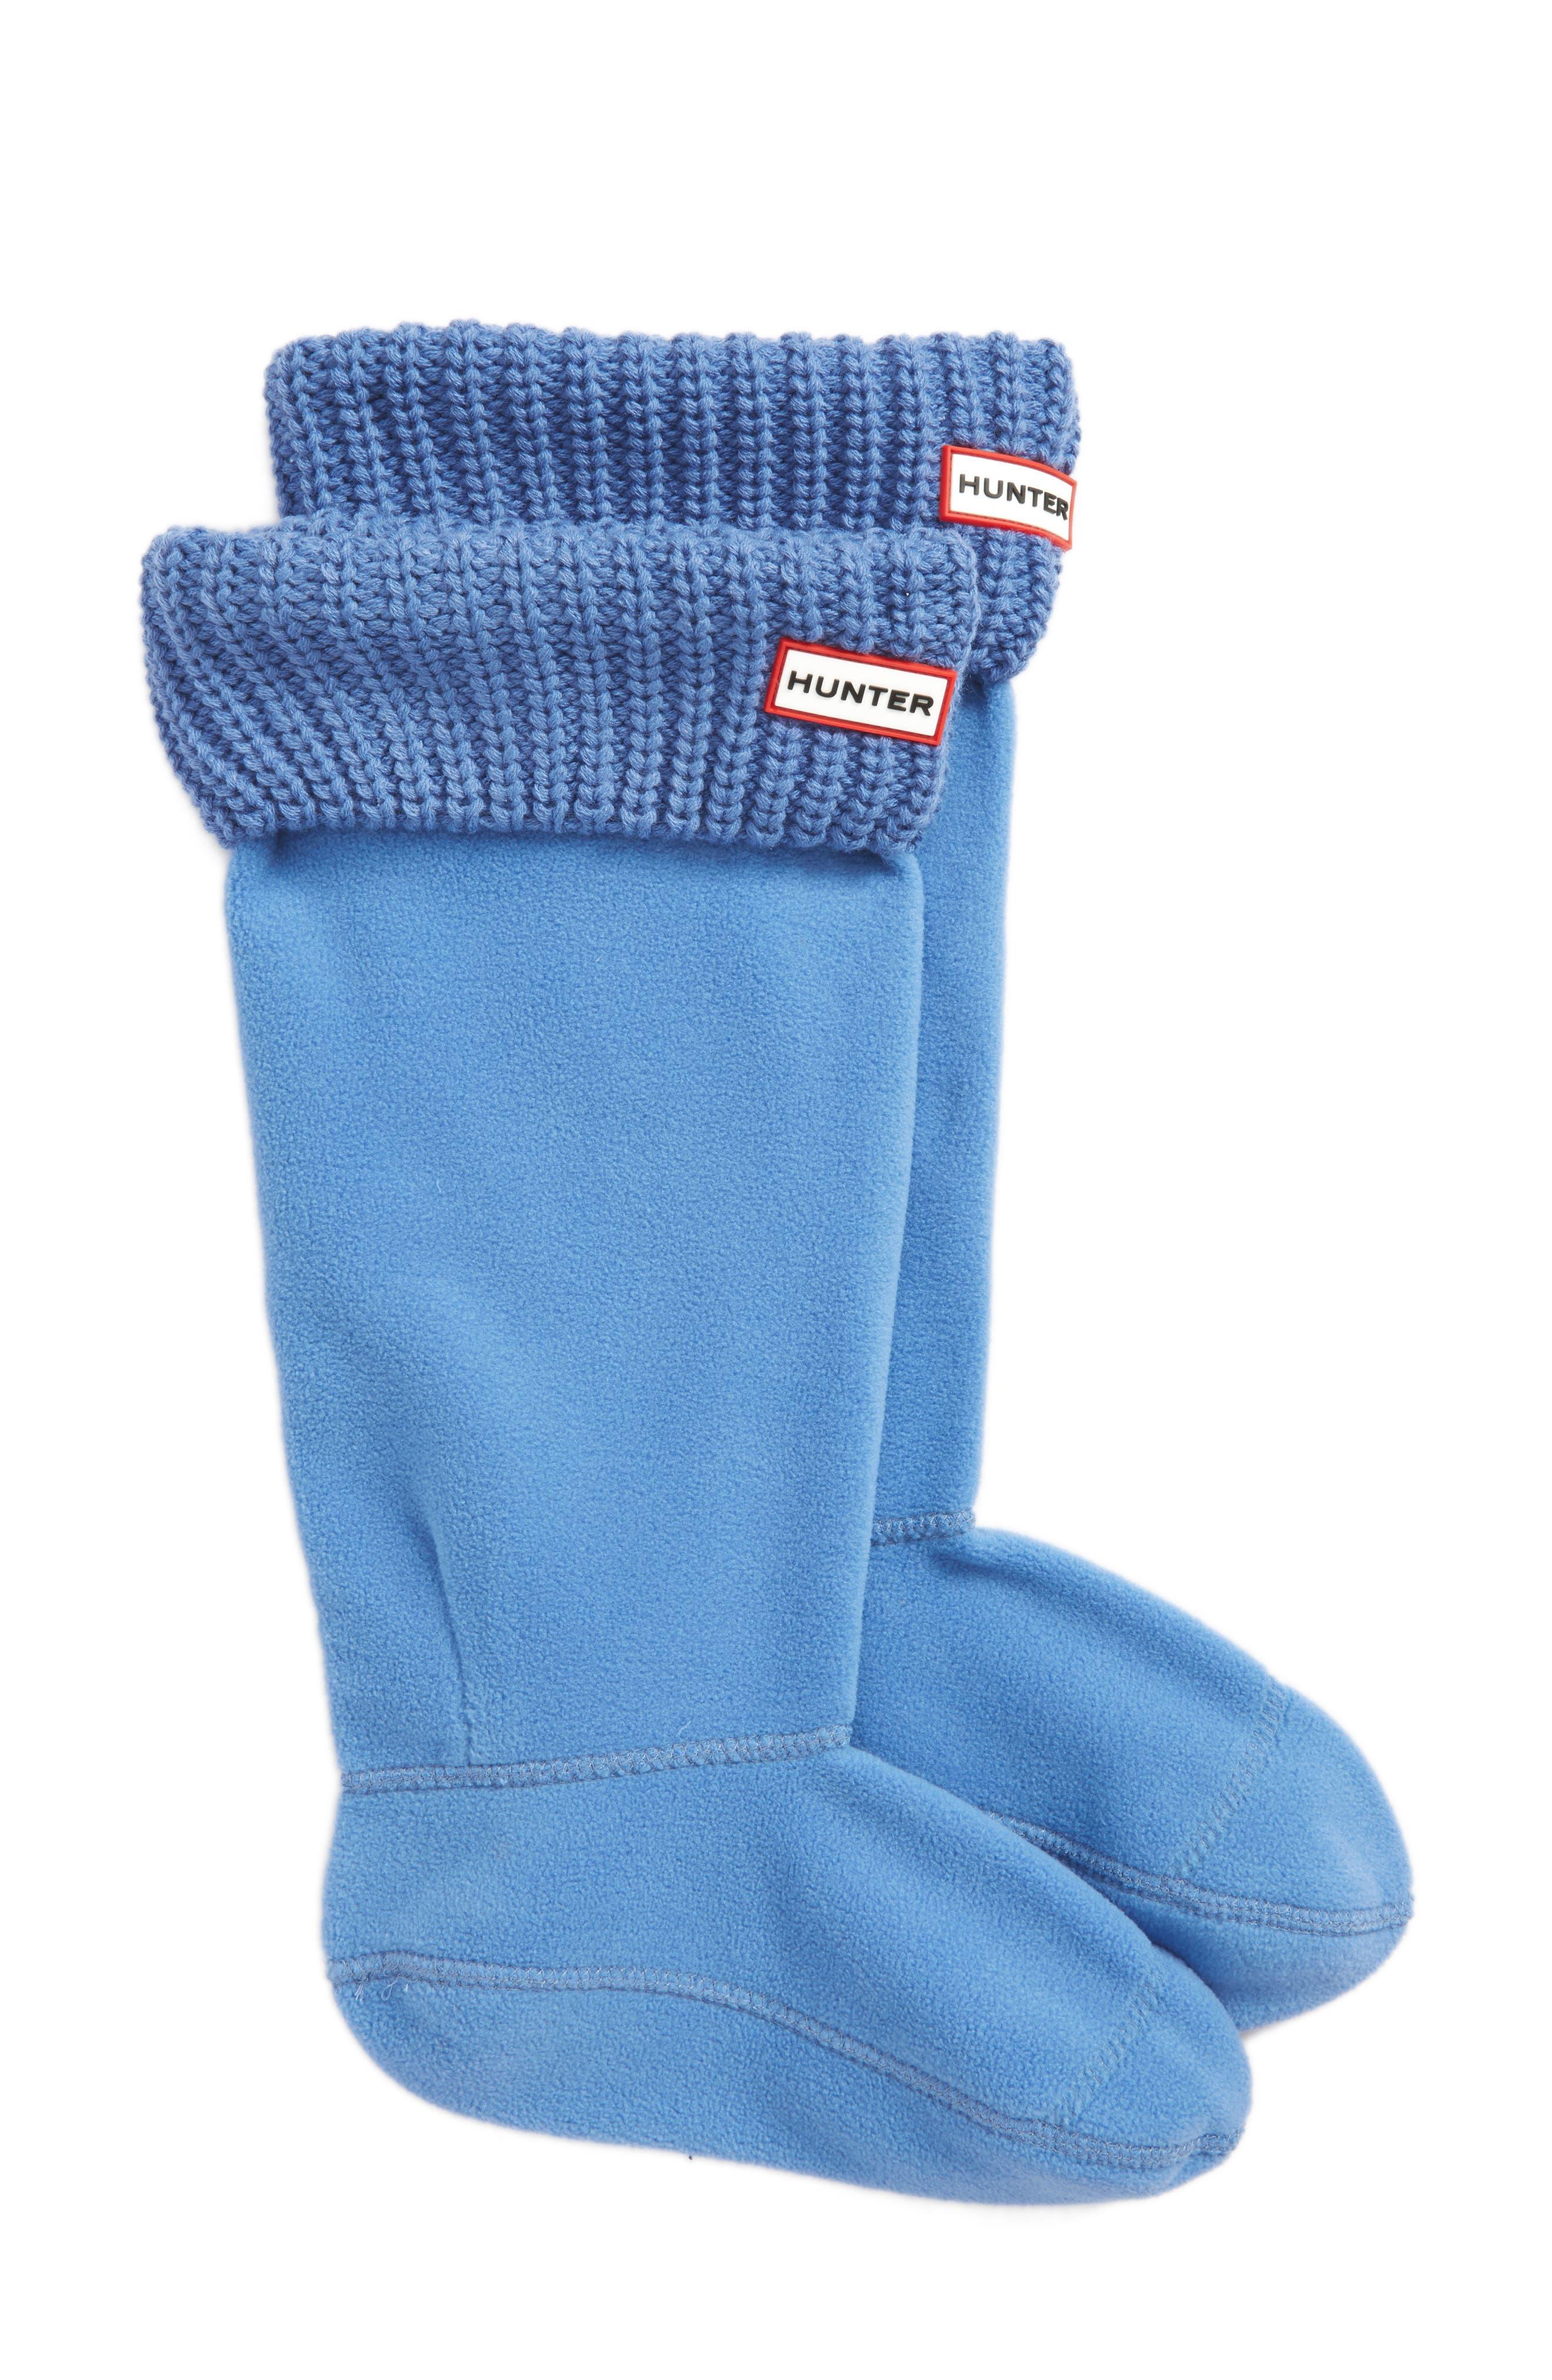 Tall Cardigan Knit Cuff Welly Boot Socks,                         Main,                         color, Ozone